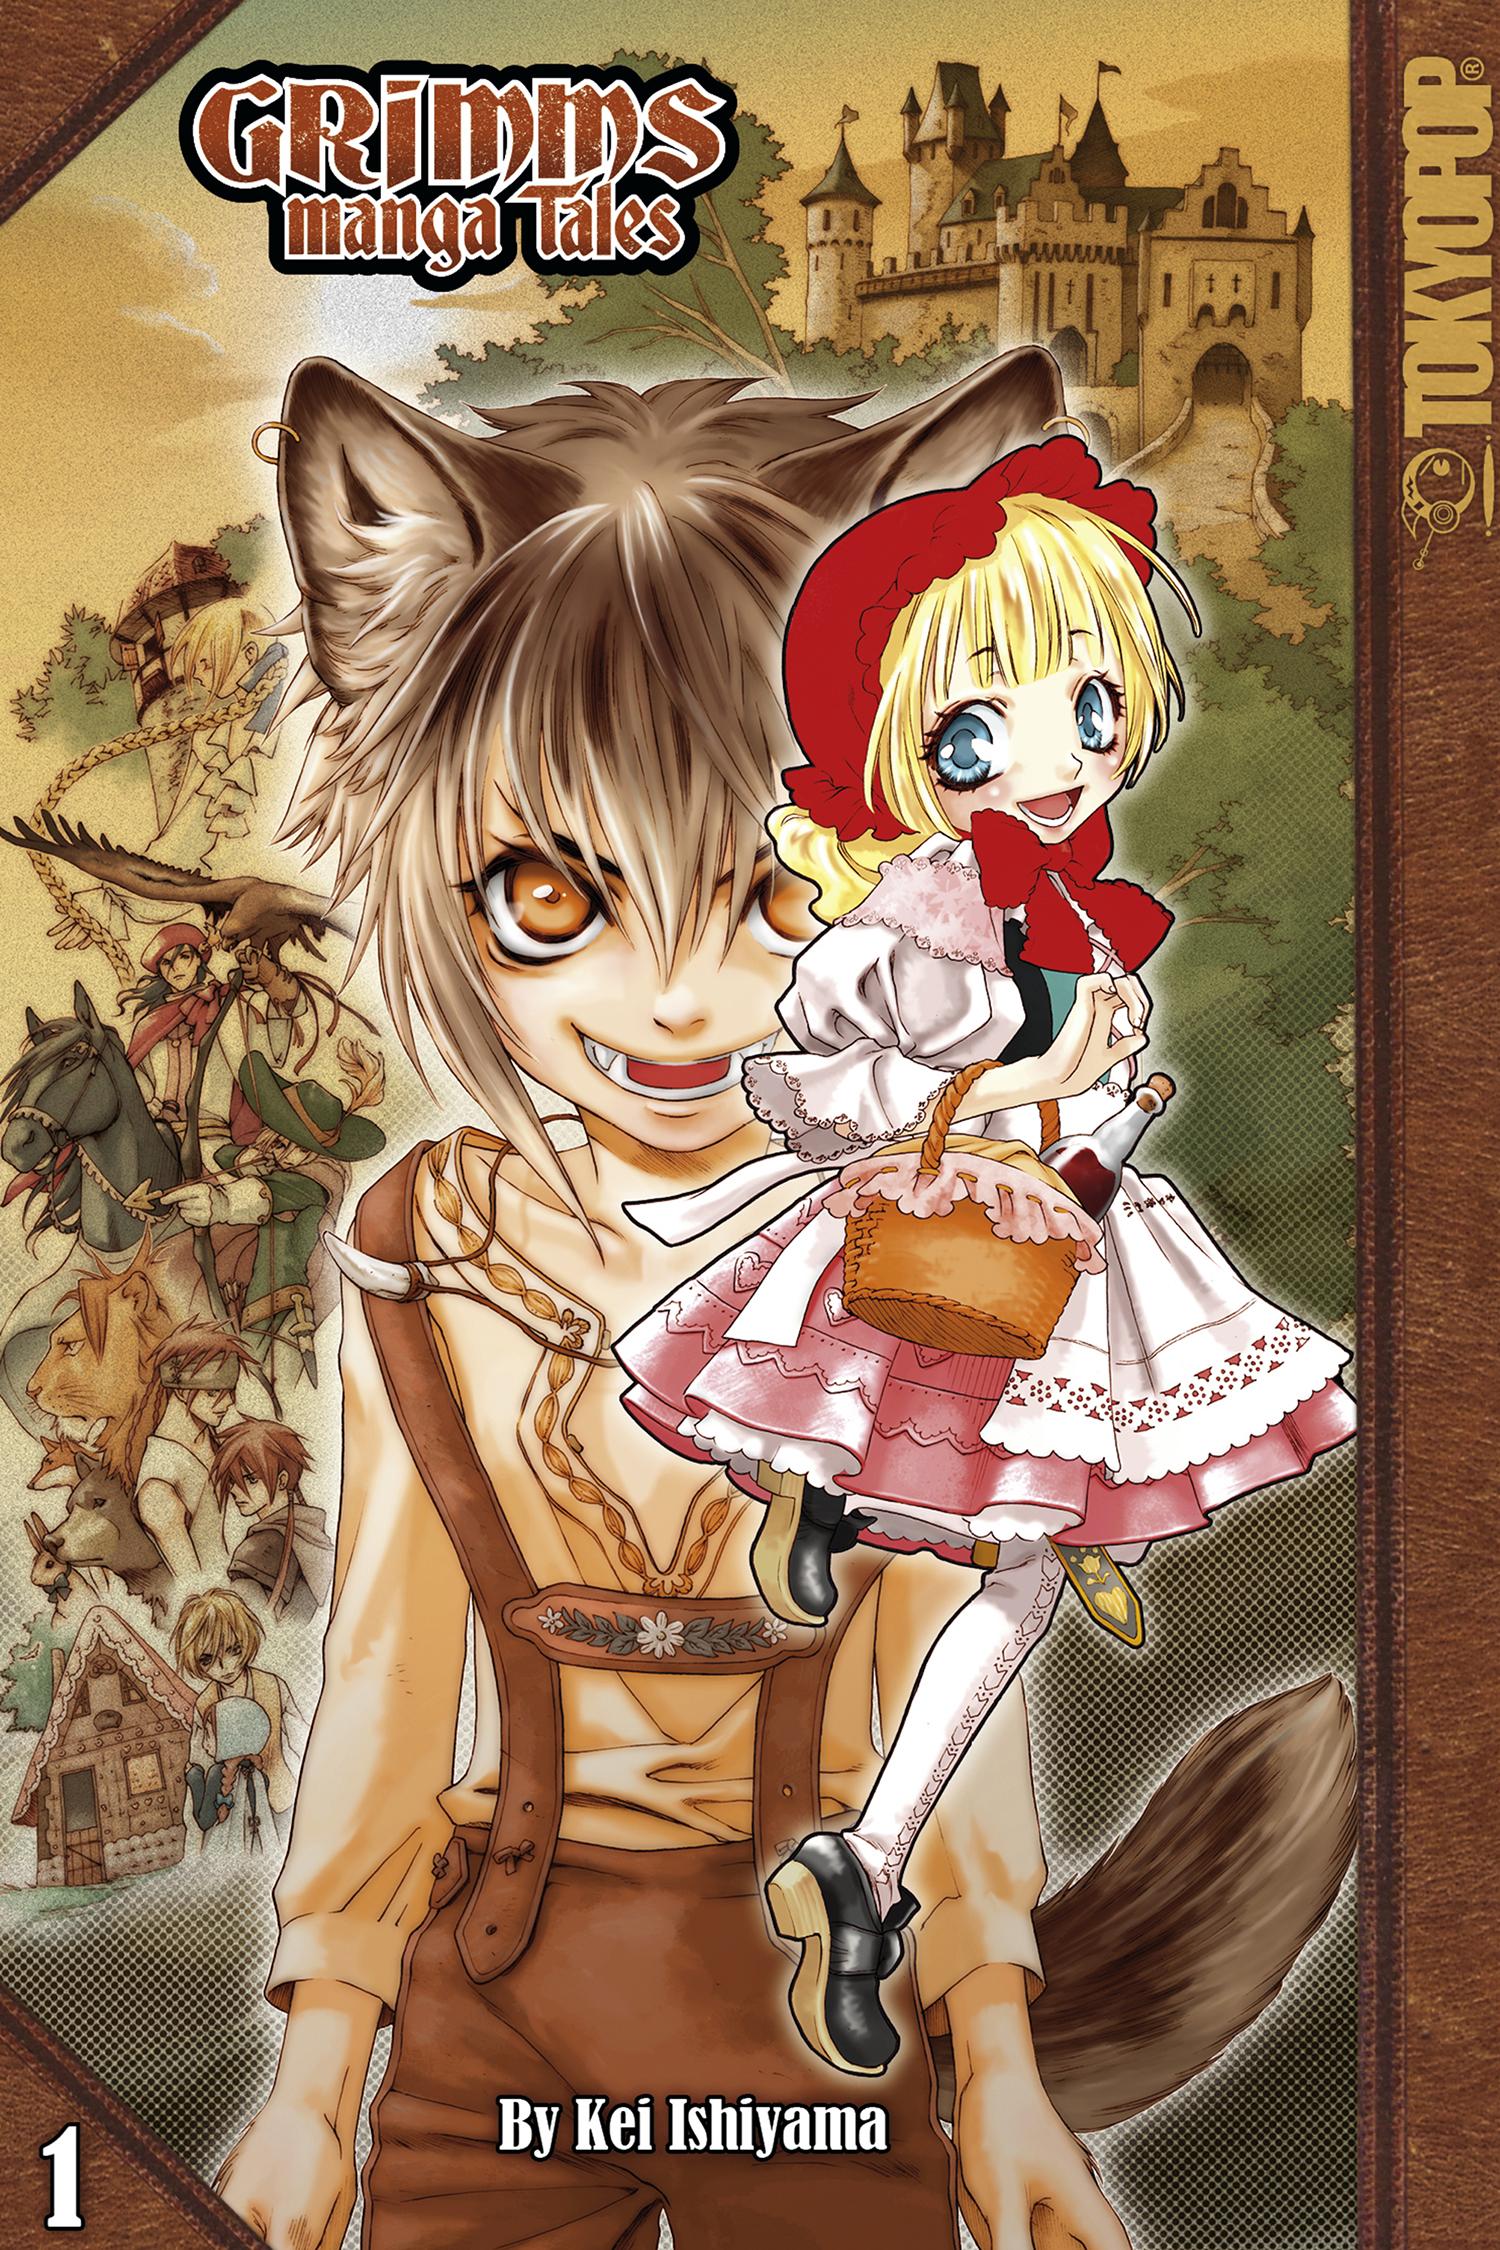 Grimms Manga Tales, Vol. 1 (ebook version)